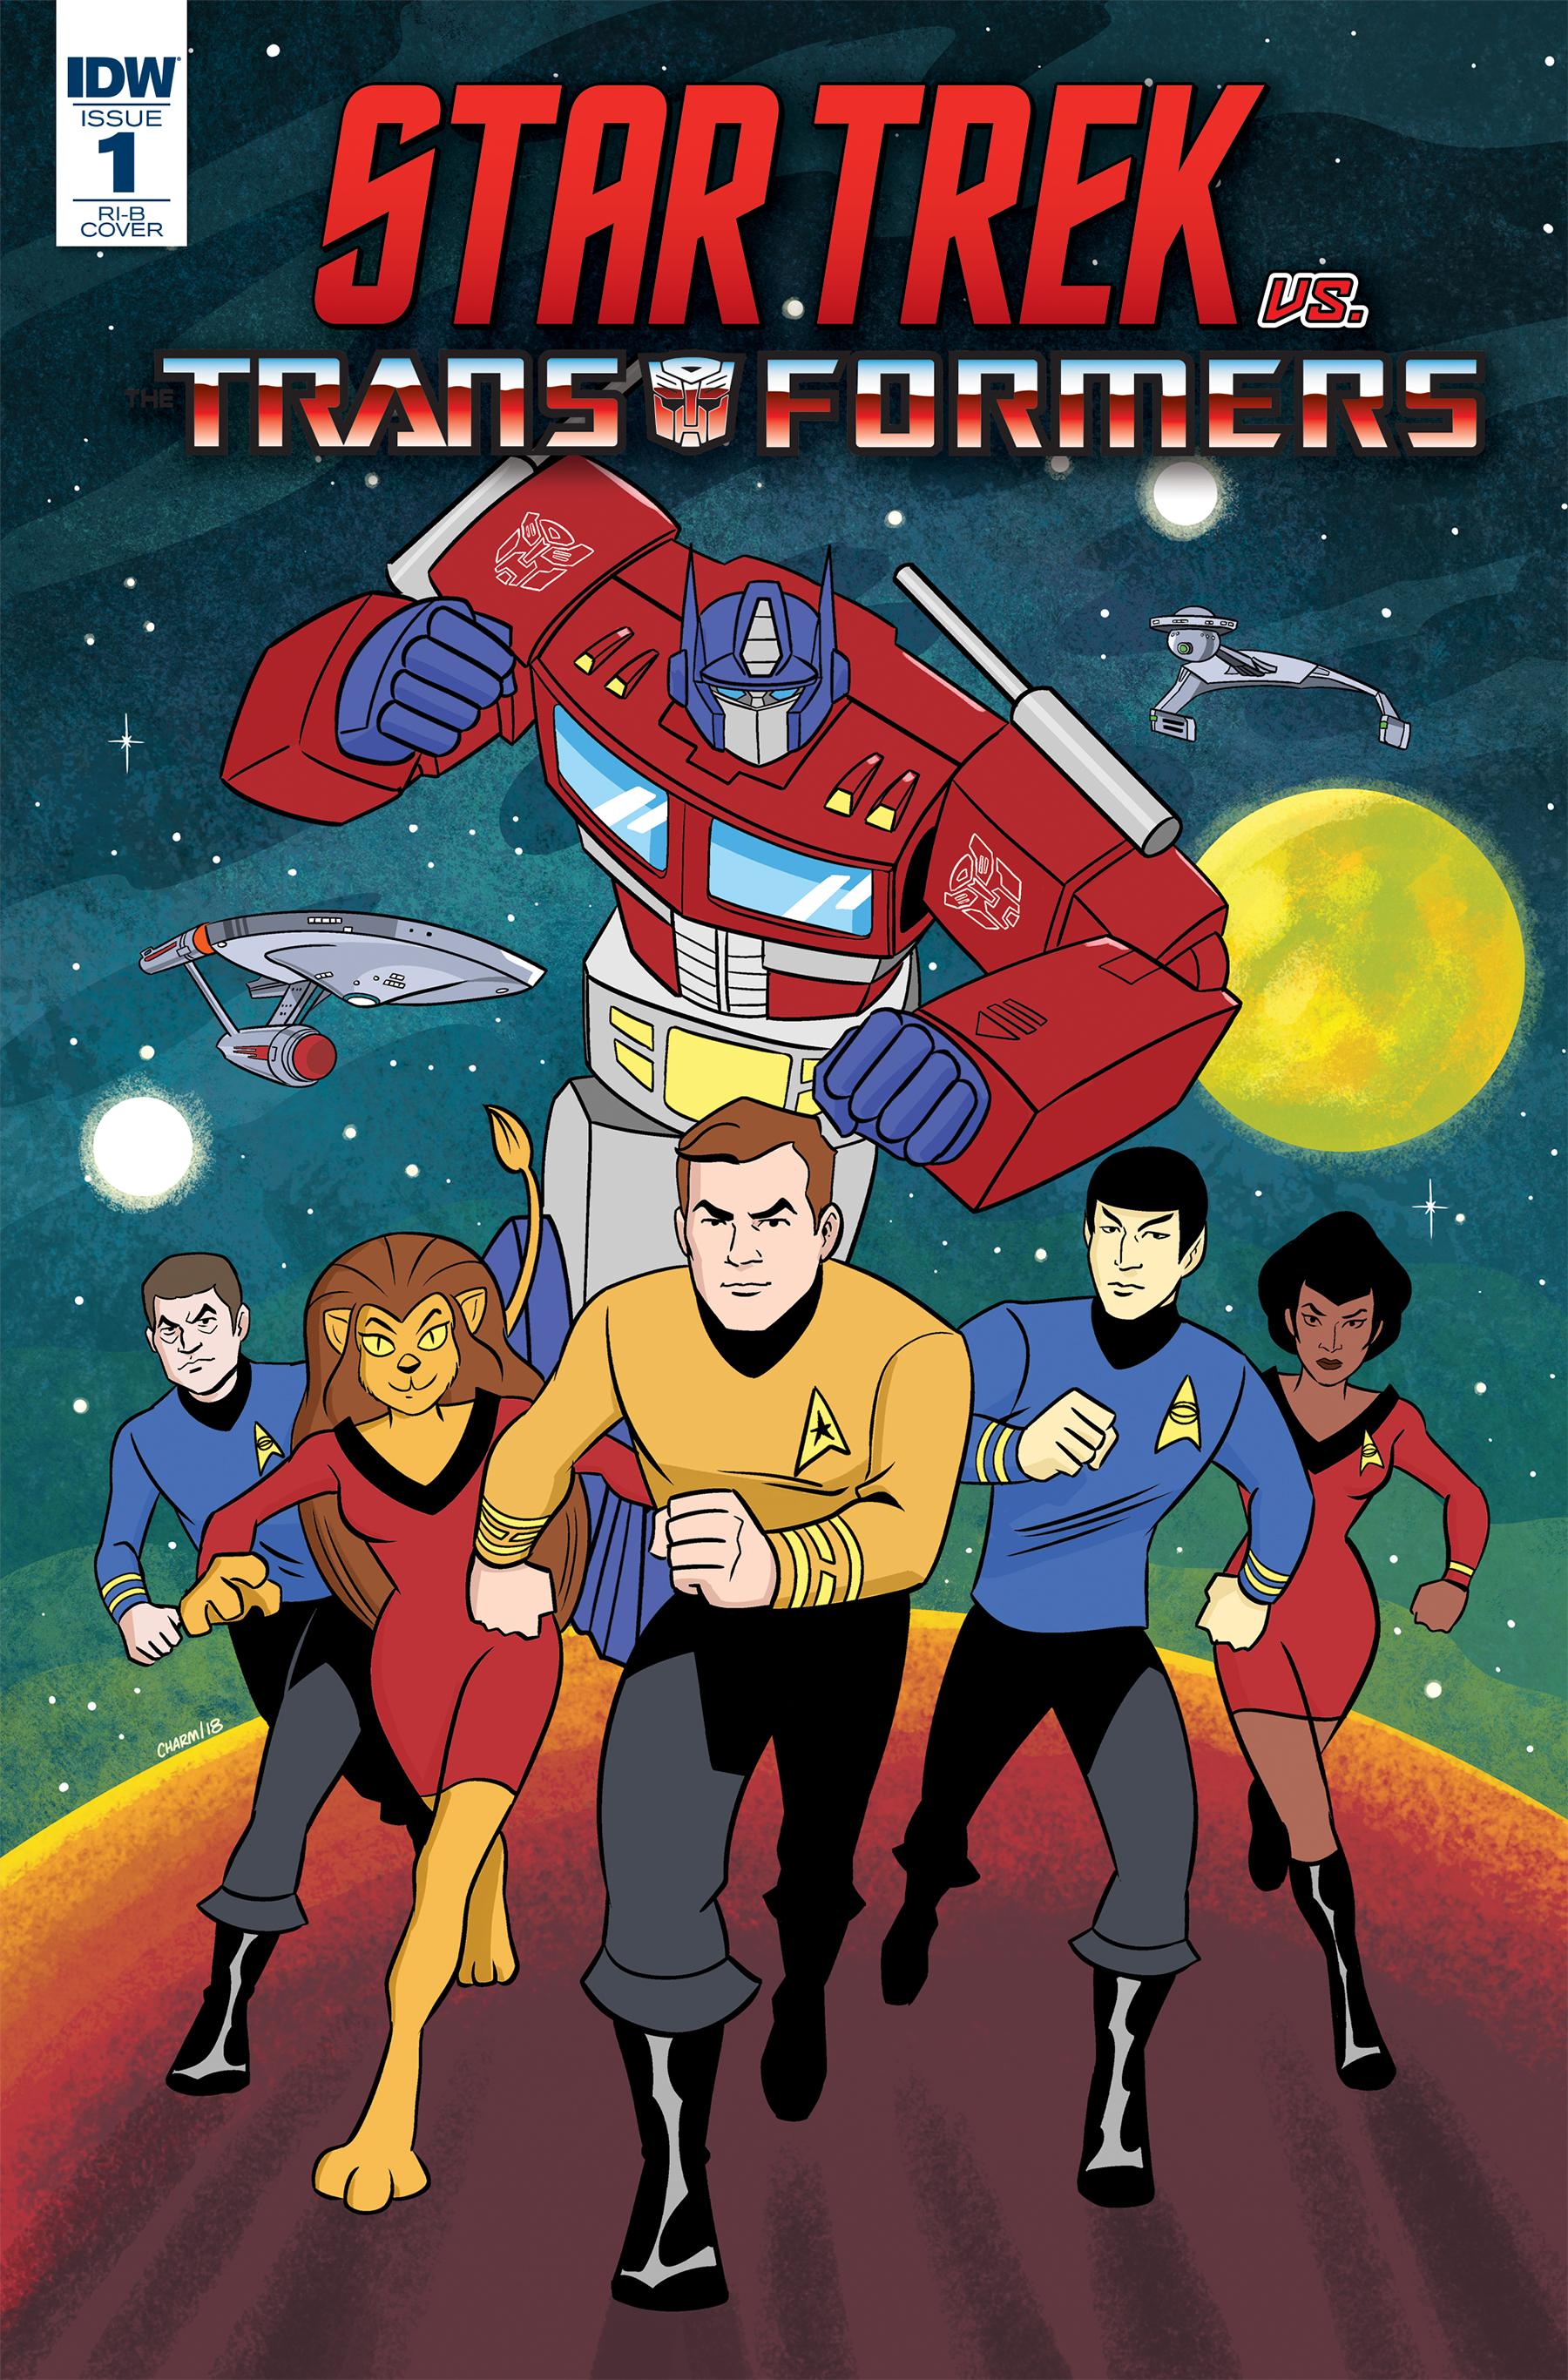 Star Trek vs Transformers